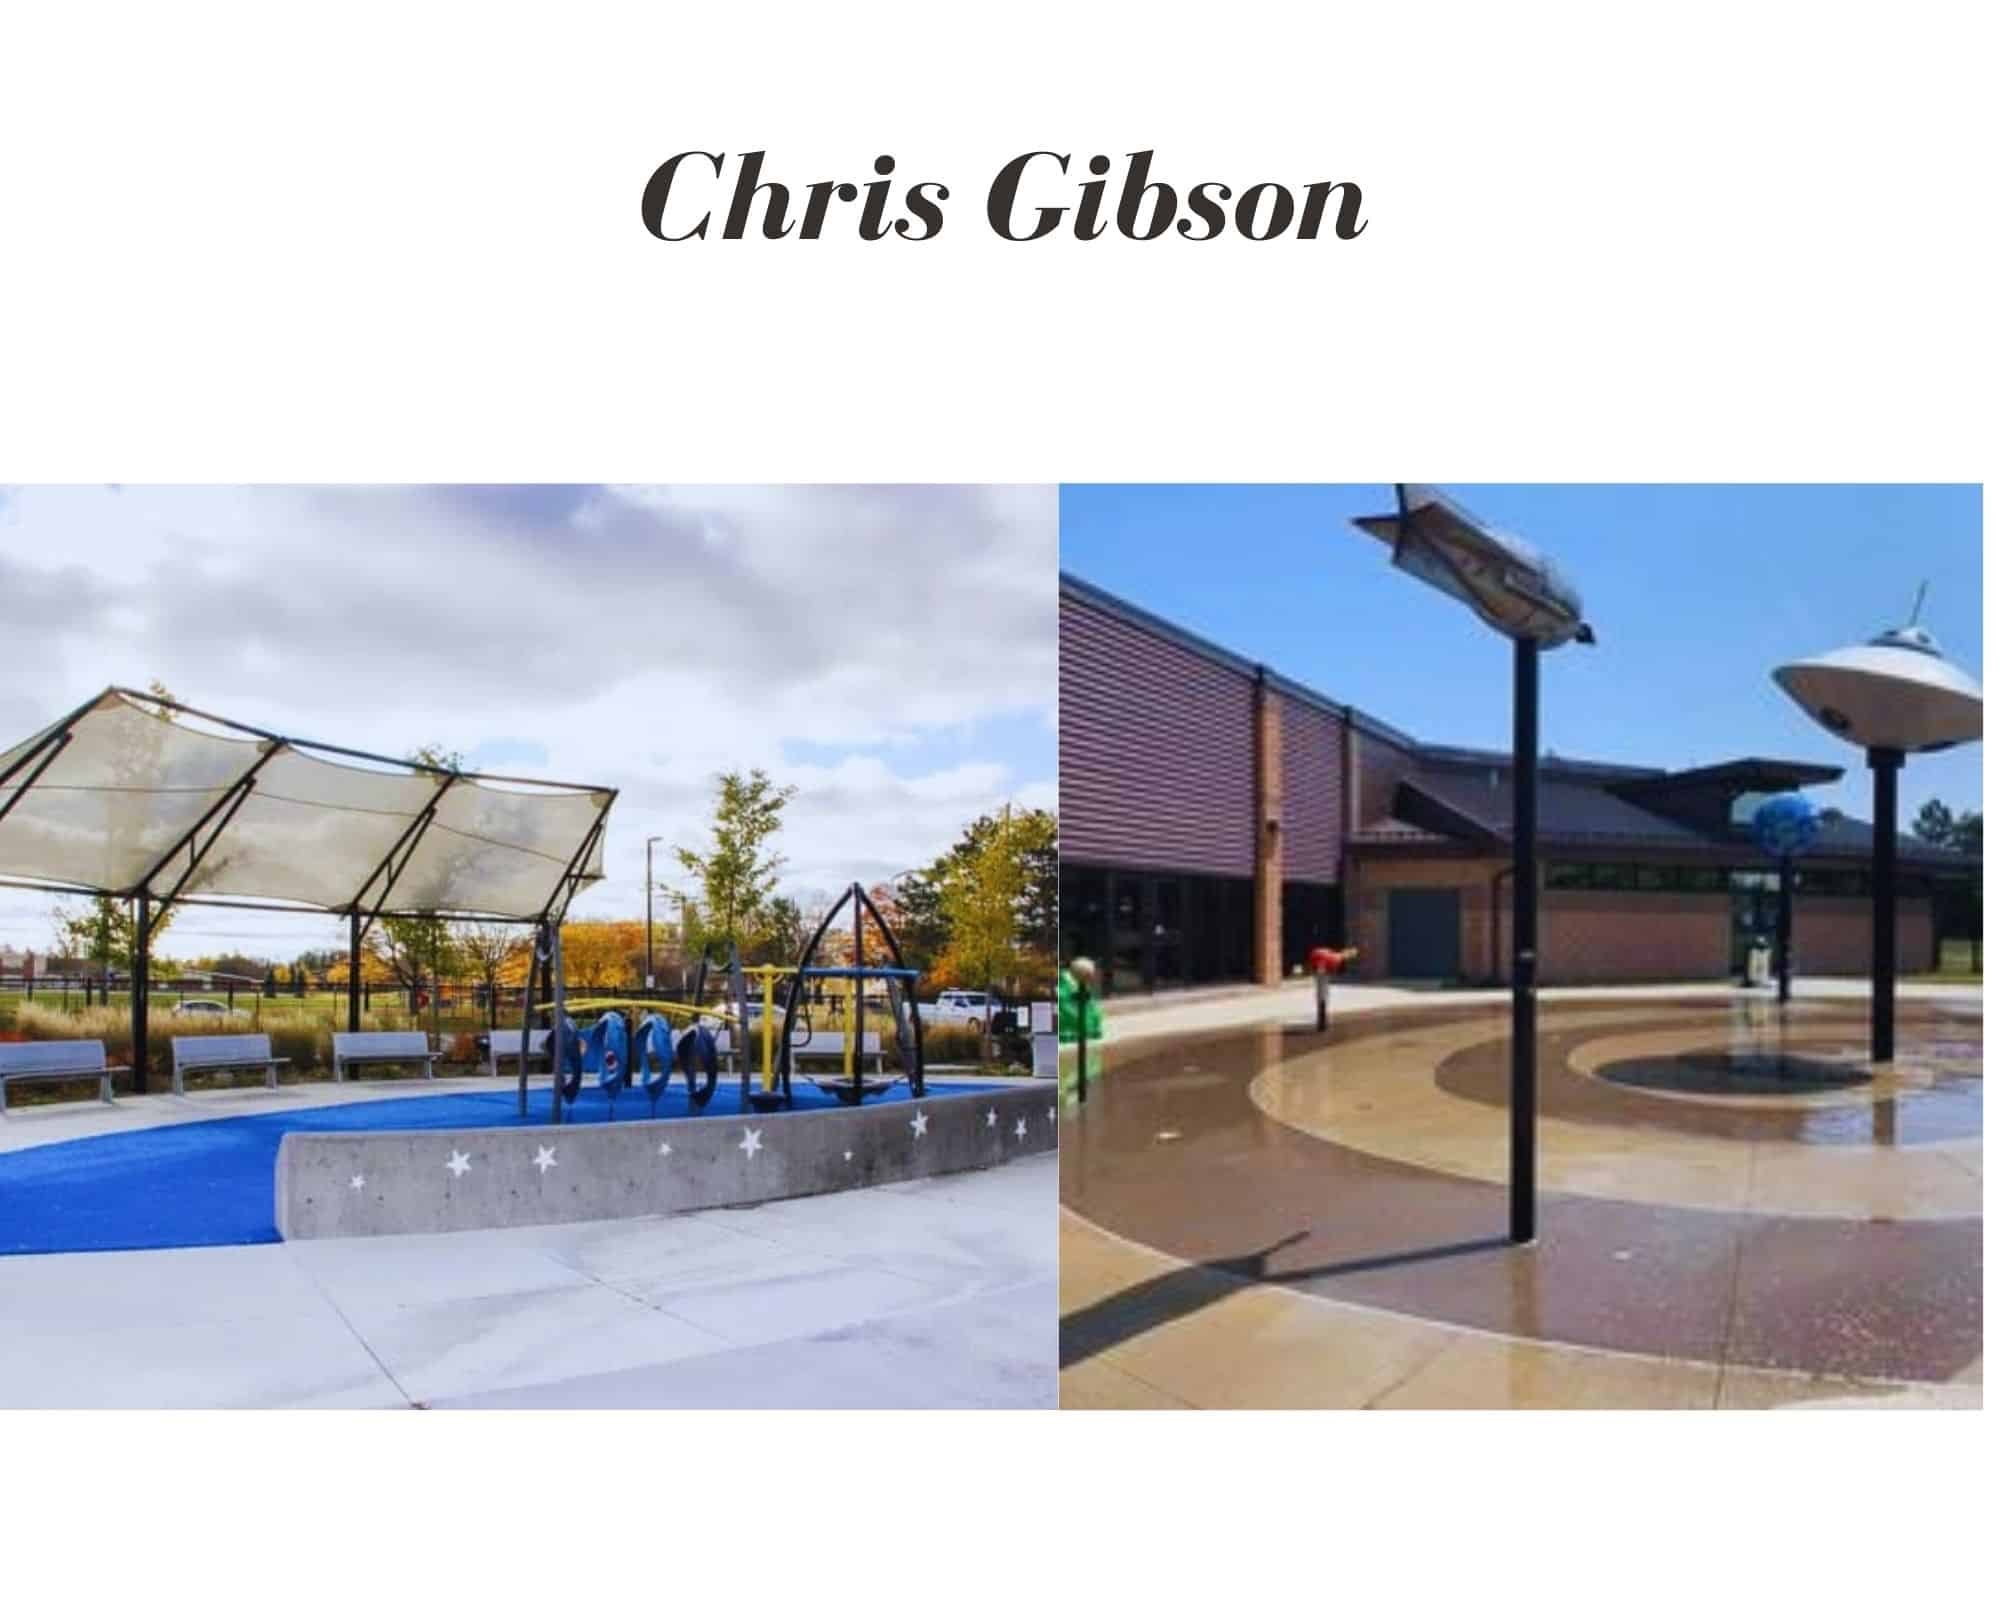 Chris Gibson Splash Pad